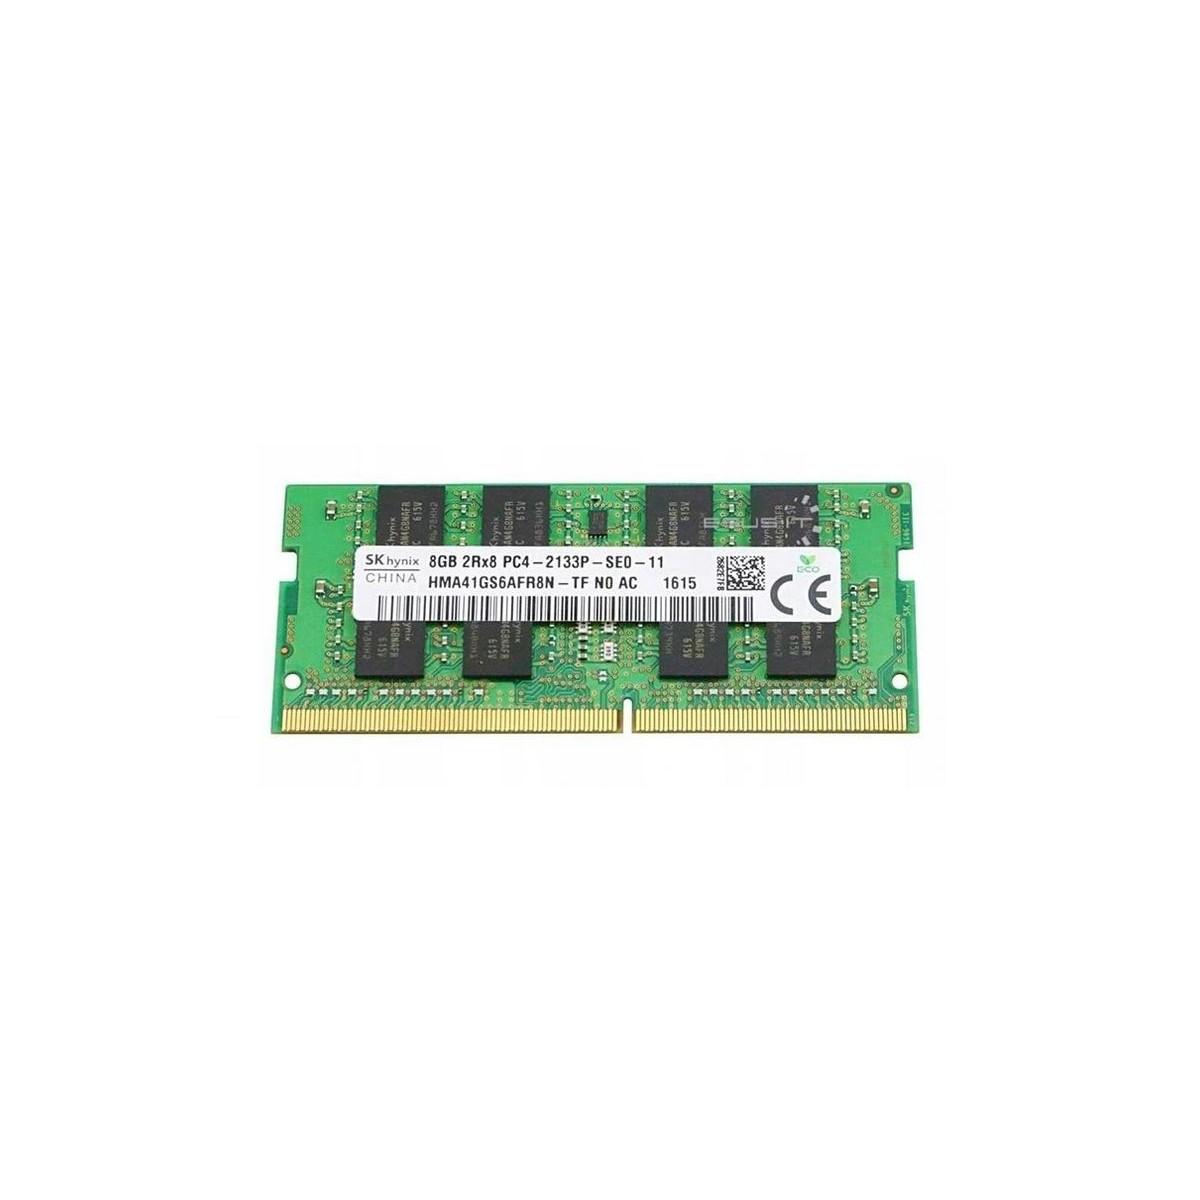 LENOVO TS150 E3-1245 v5 16GB DDR4 600 SSD